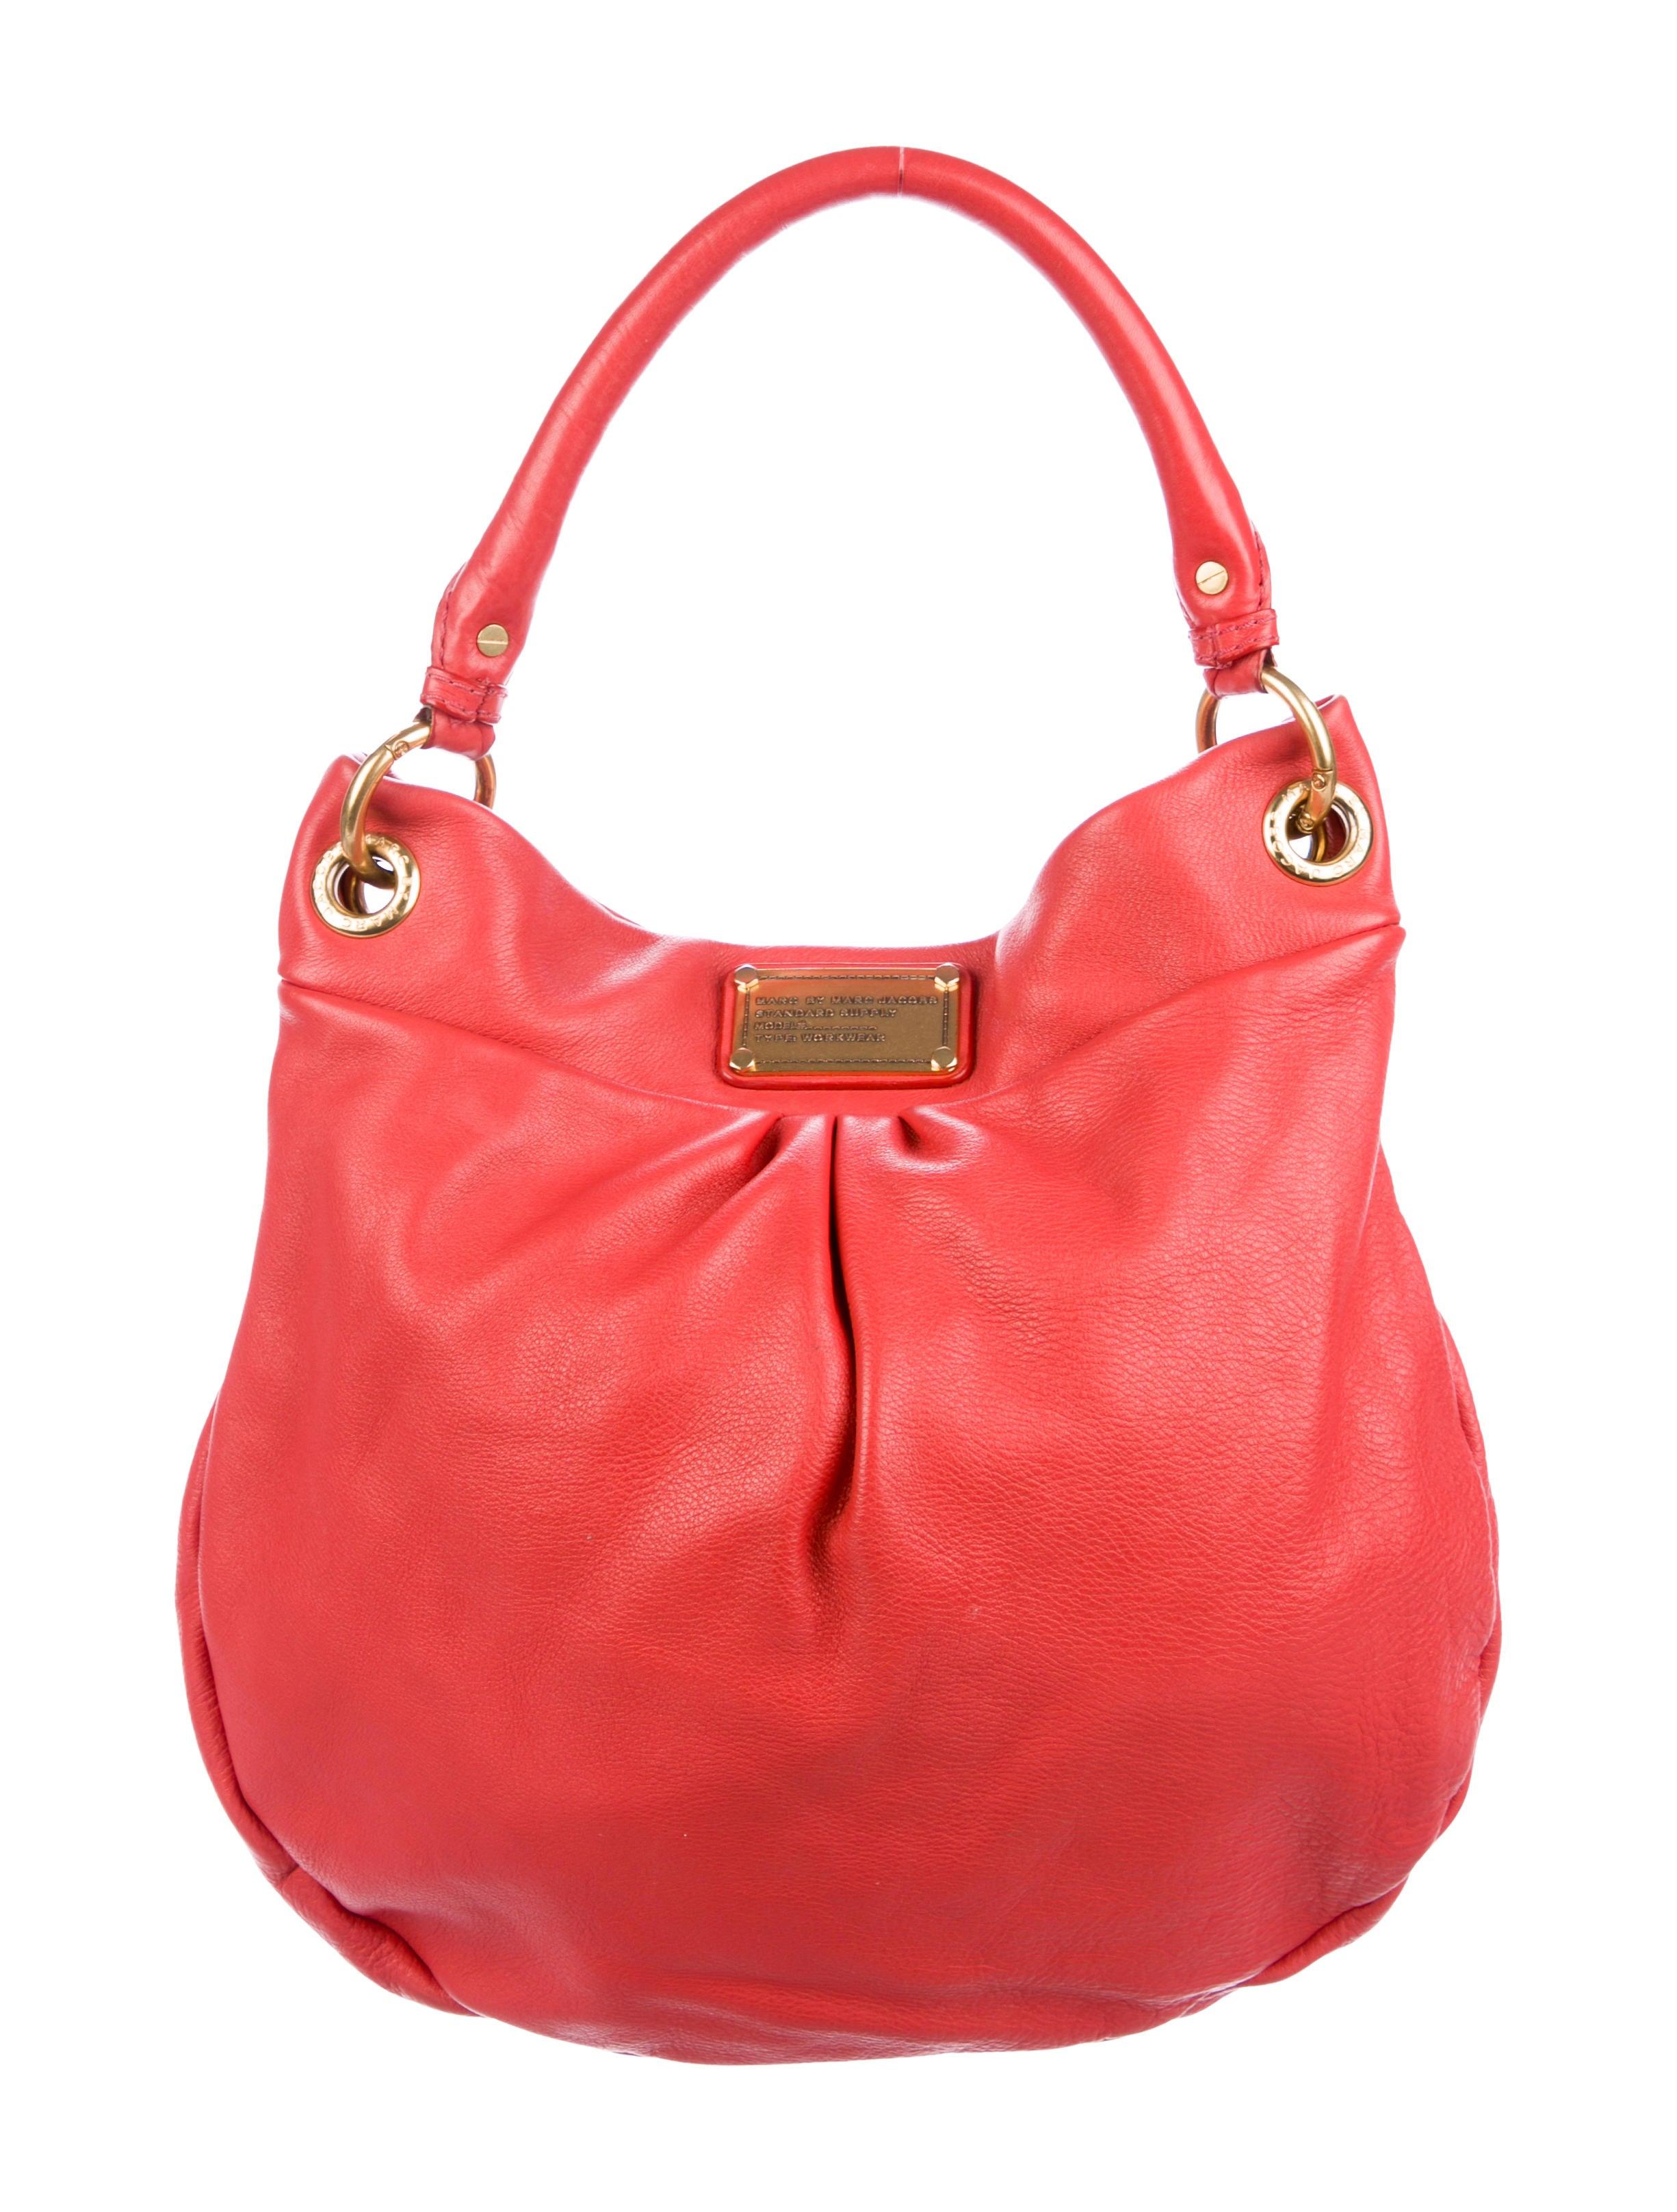 a2d507130aac Marc by Marc Jacobs Classic Q Hillier Hobo - Handbags - WMA27099 ...